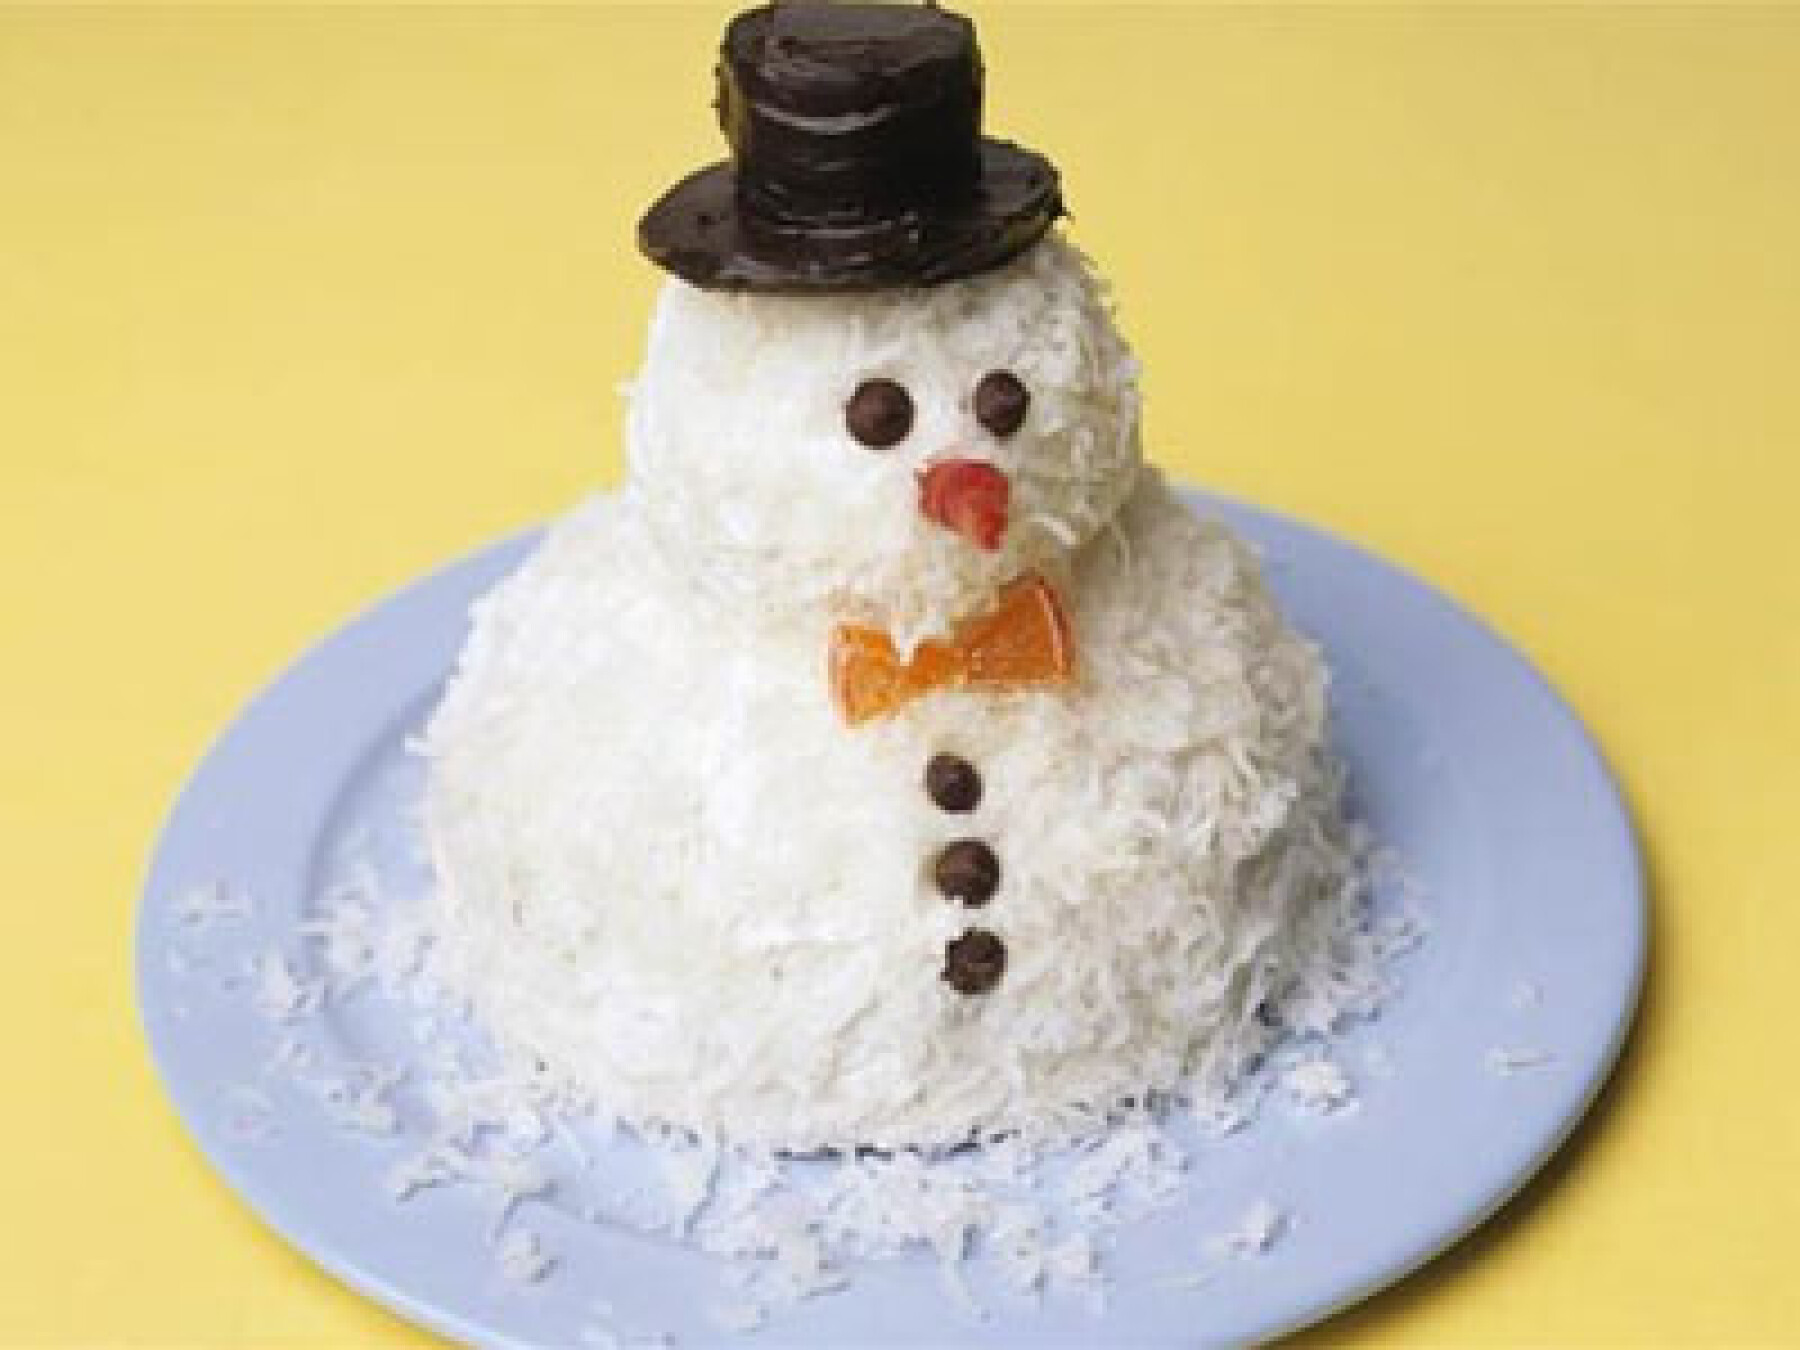 Recette de Noël : Bonhommes de neige coco choco